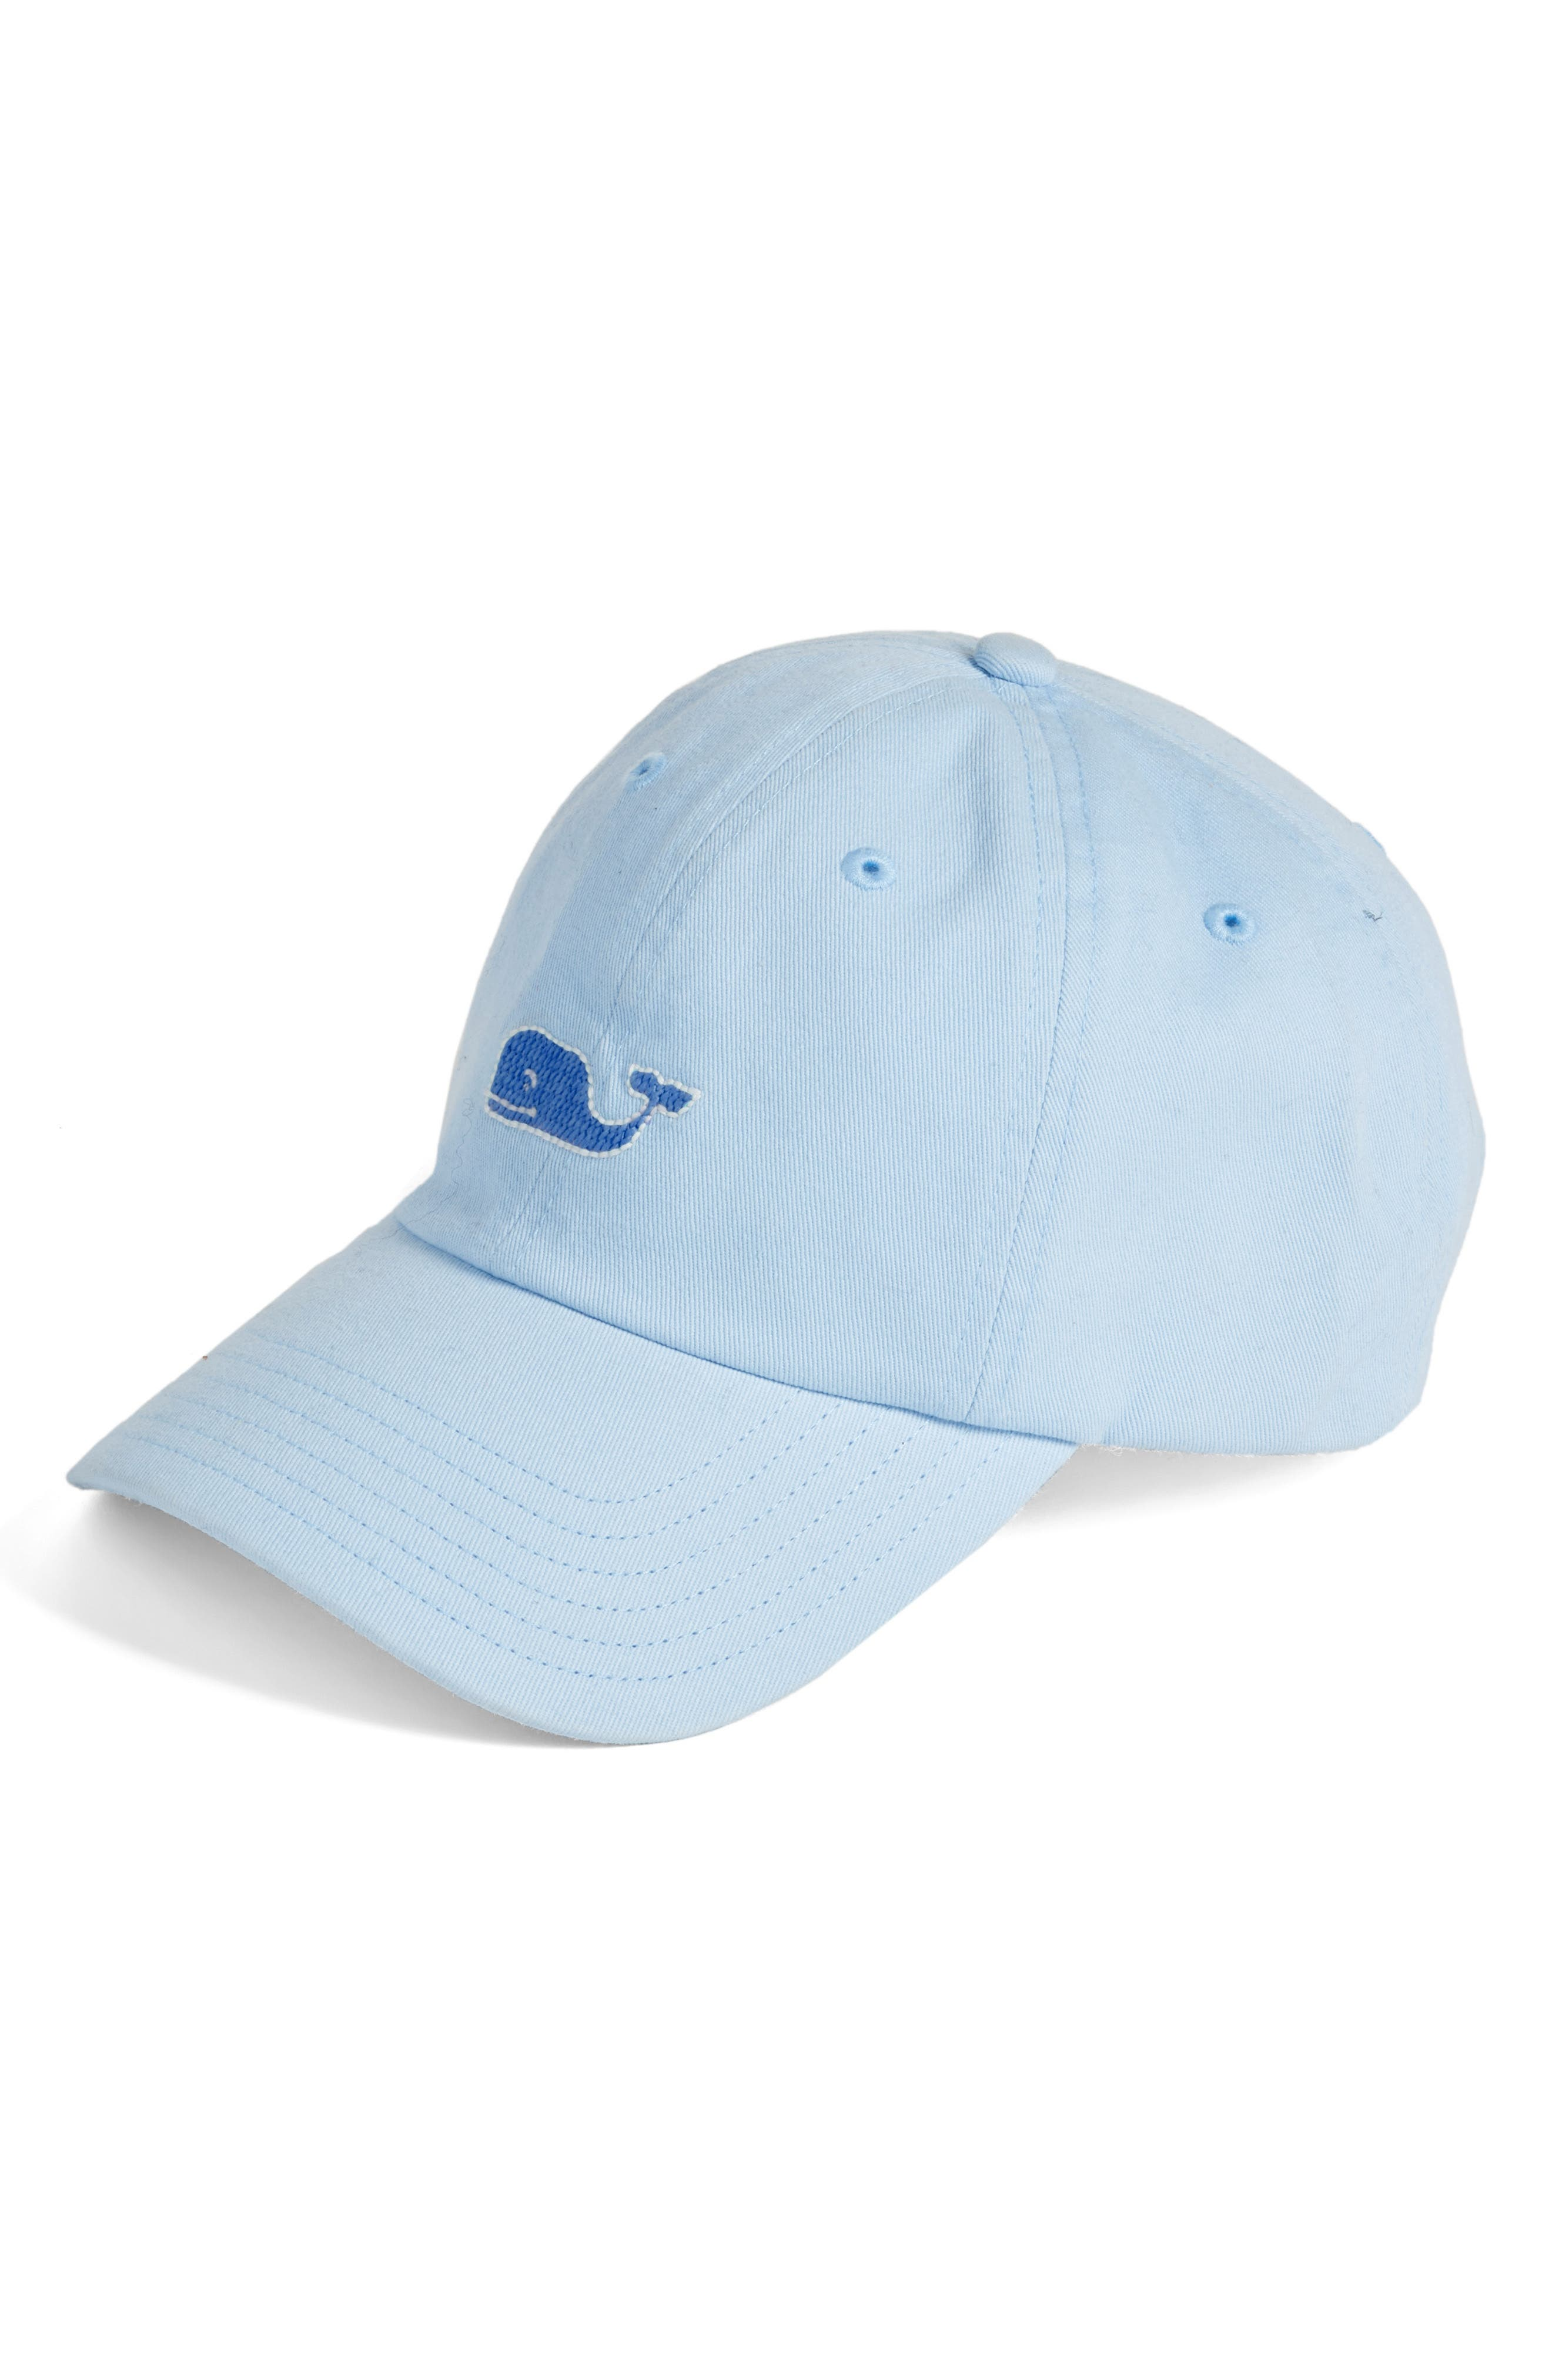 Main Image - Vineyard Vines Needlepoint Whale Baseball Cap